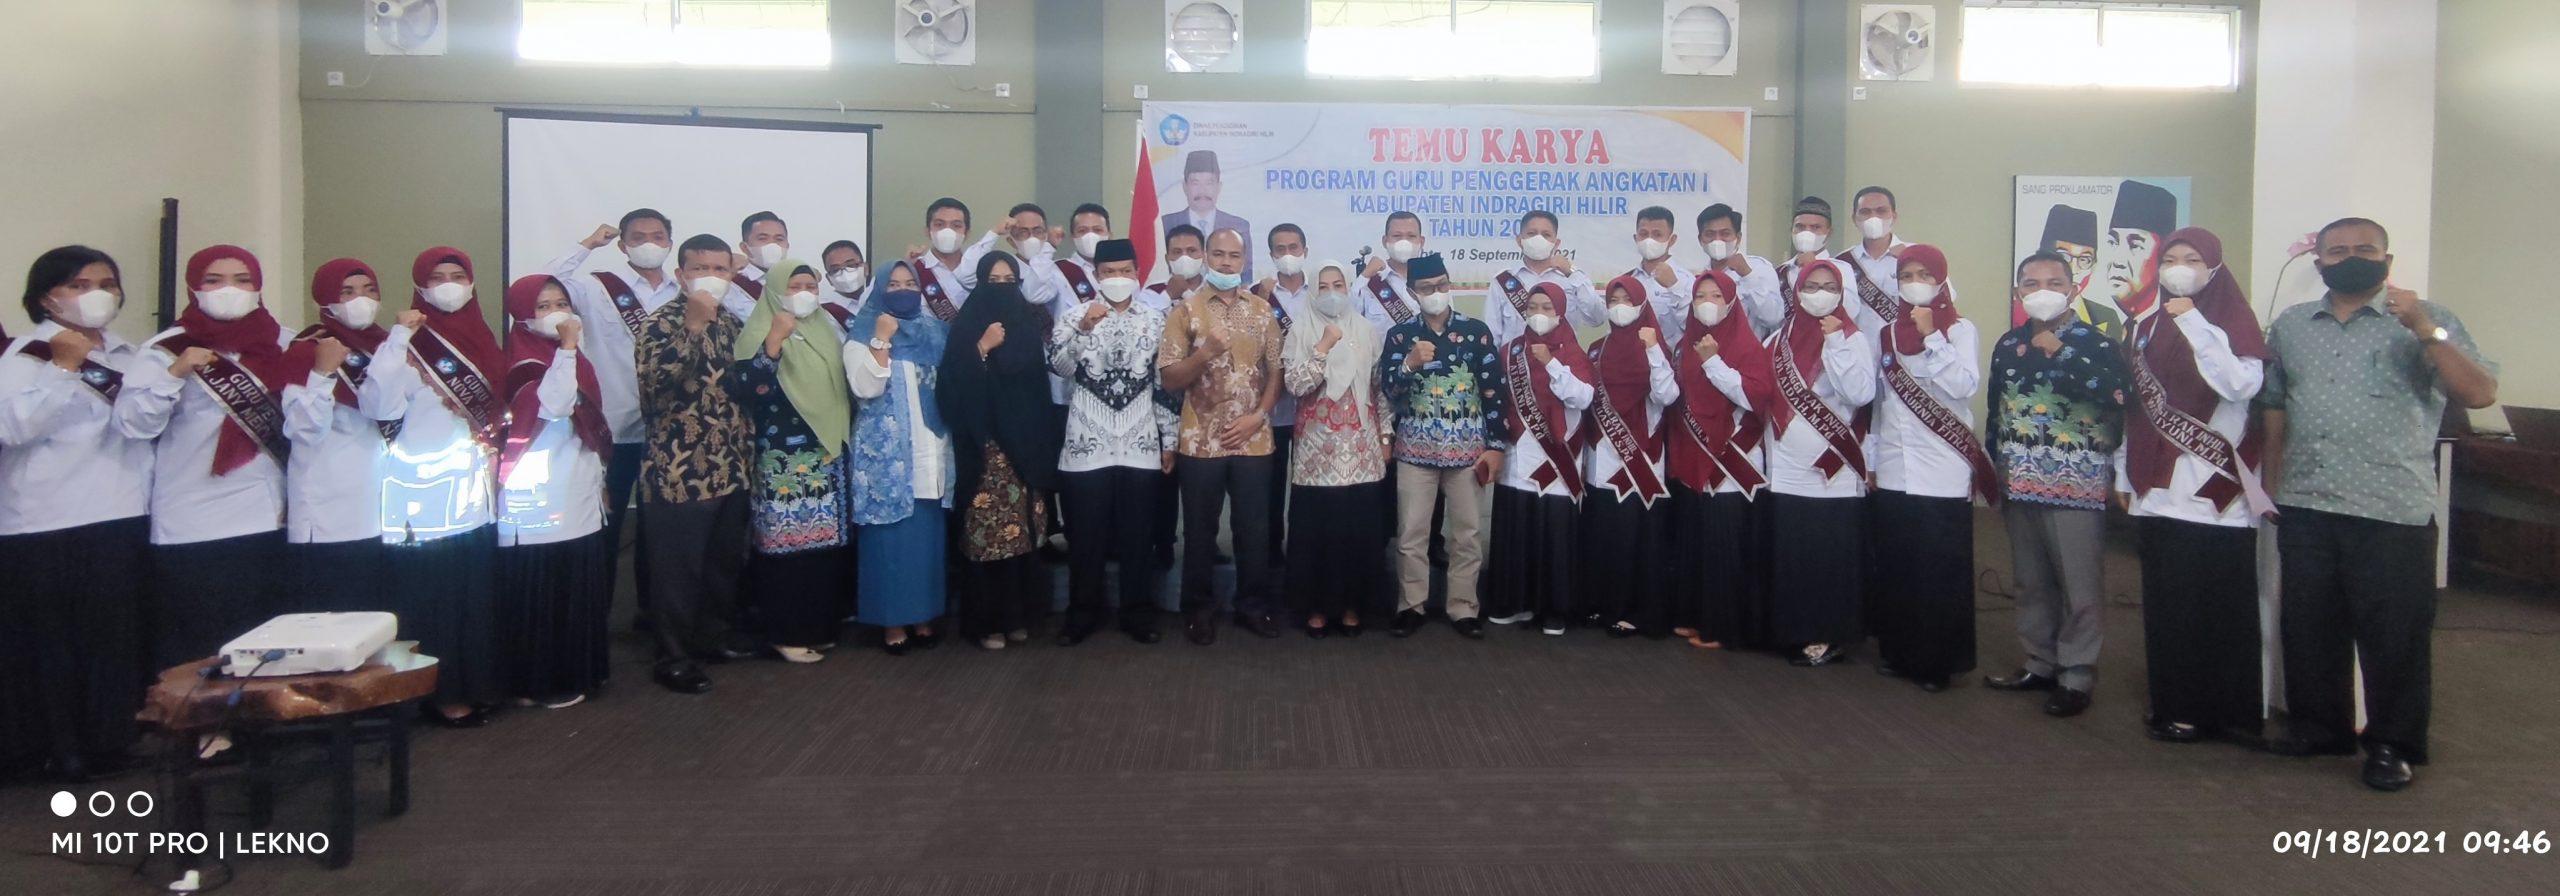 Temu Karya, 27 Guru Pengerak Angkatan I Resmi Diserahkan Ke Disdik Inhil